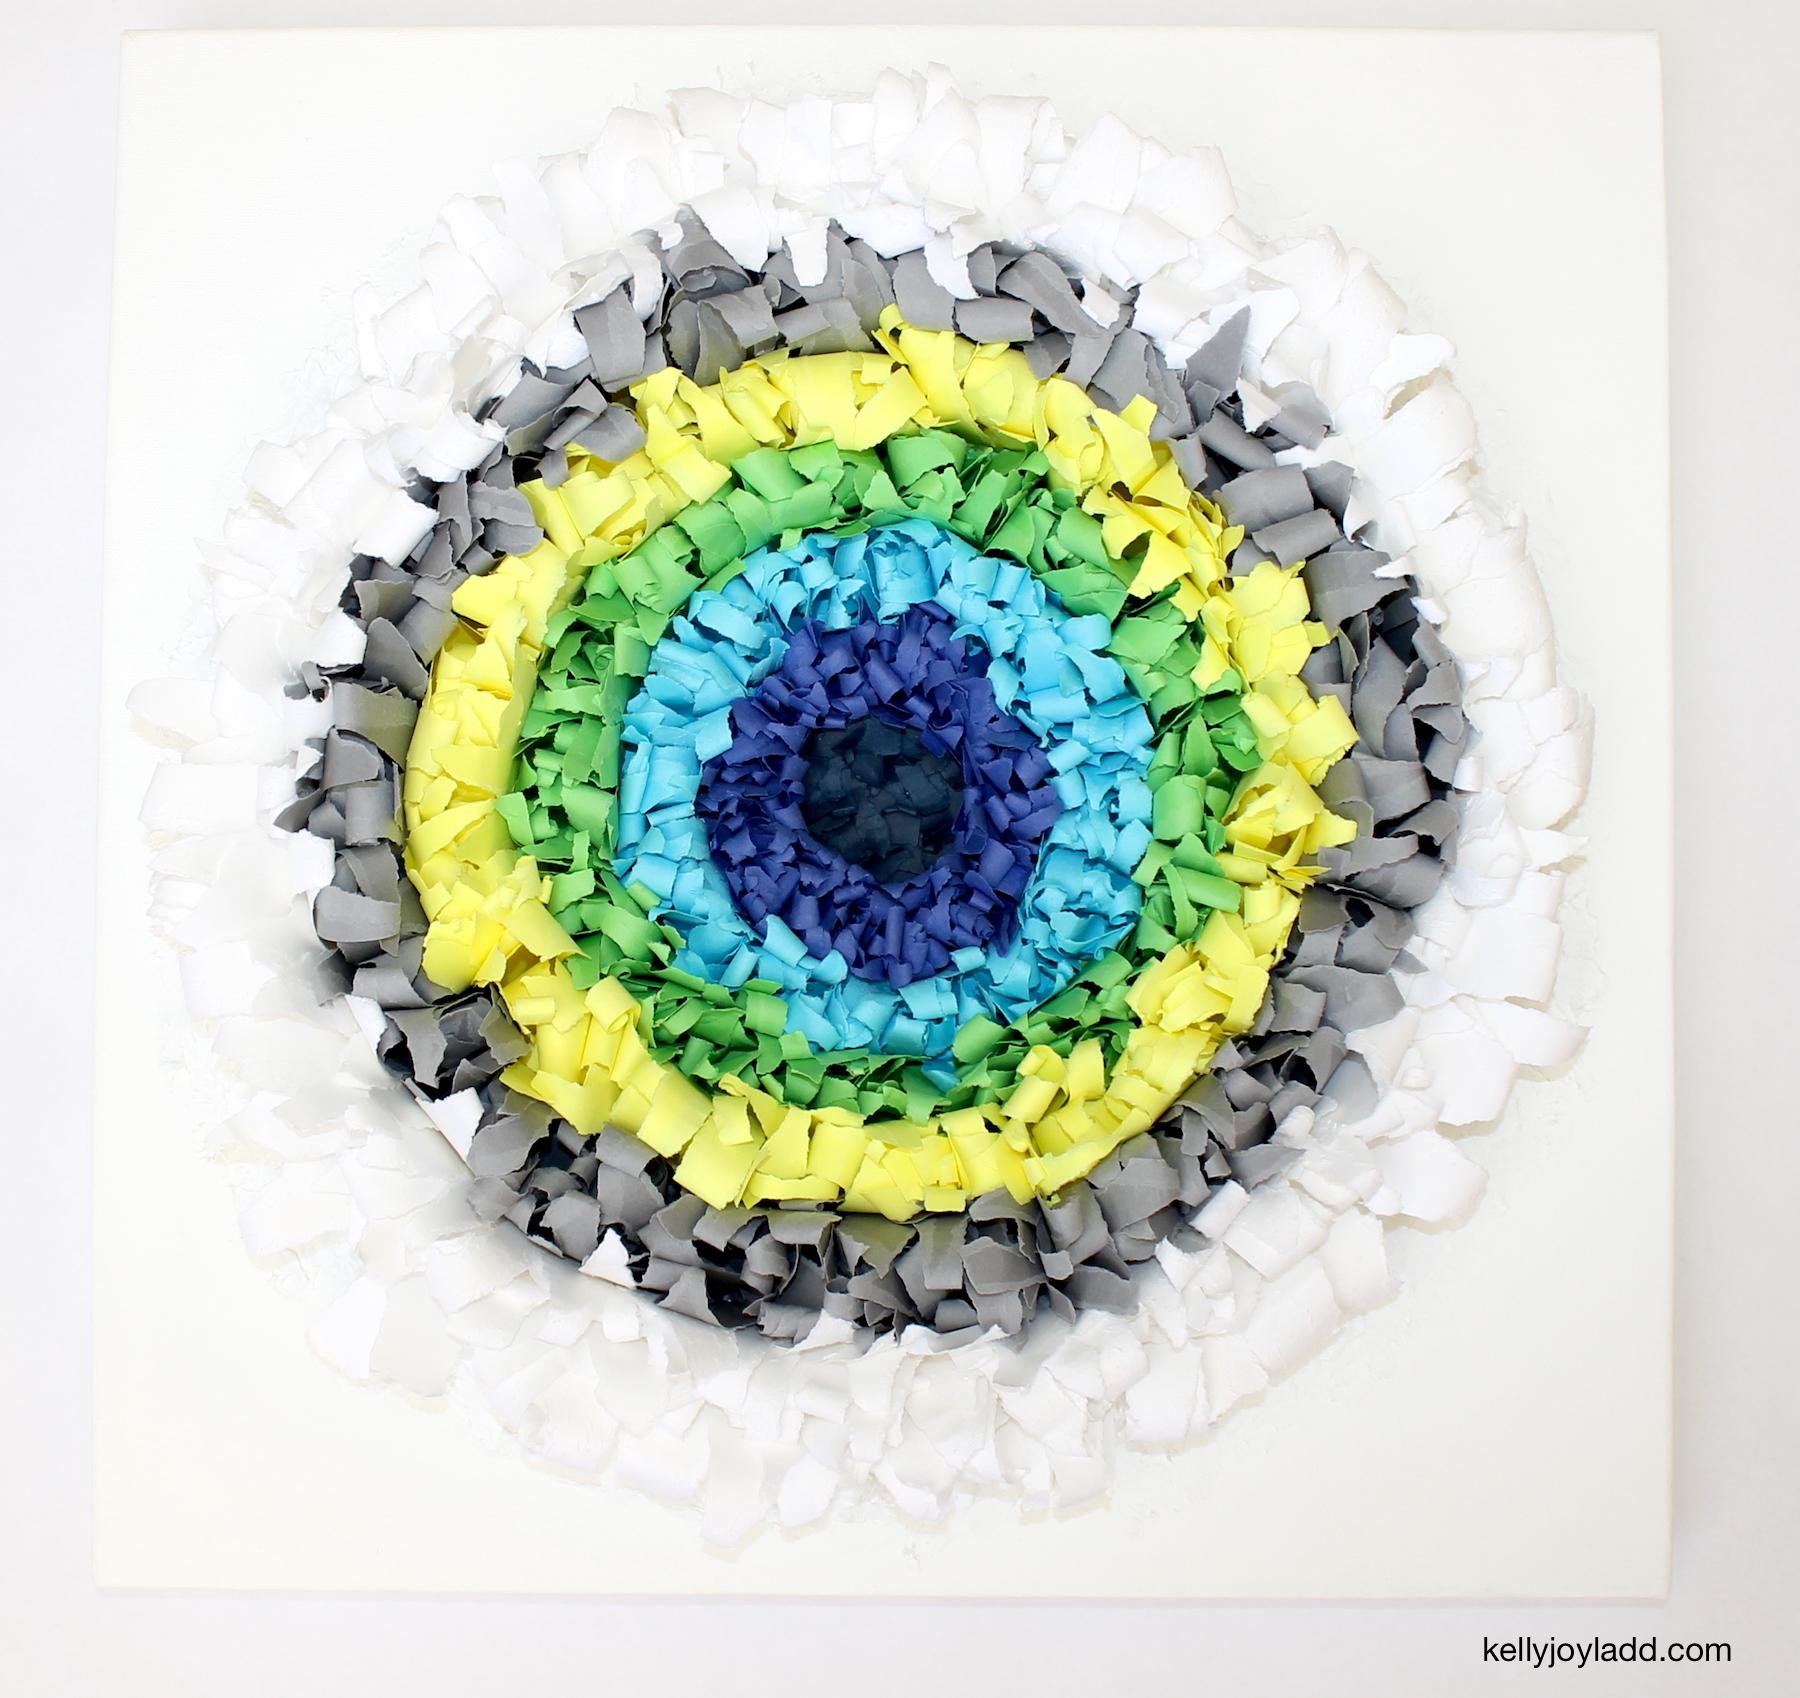 kellyjoyladd.com; paper art, orlando artist,